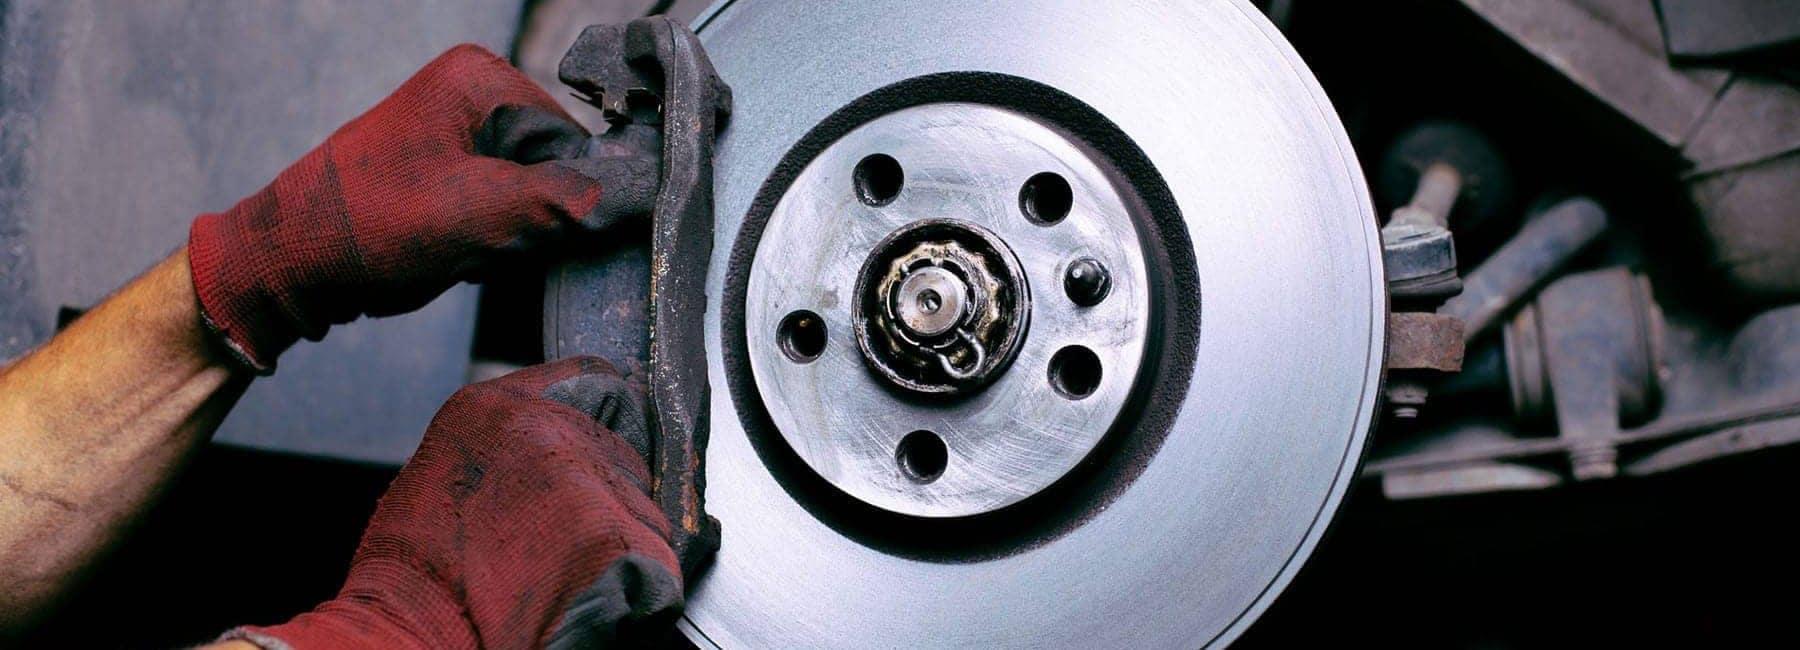 Closeup of a mechanic replacing the brake pad on a car